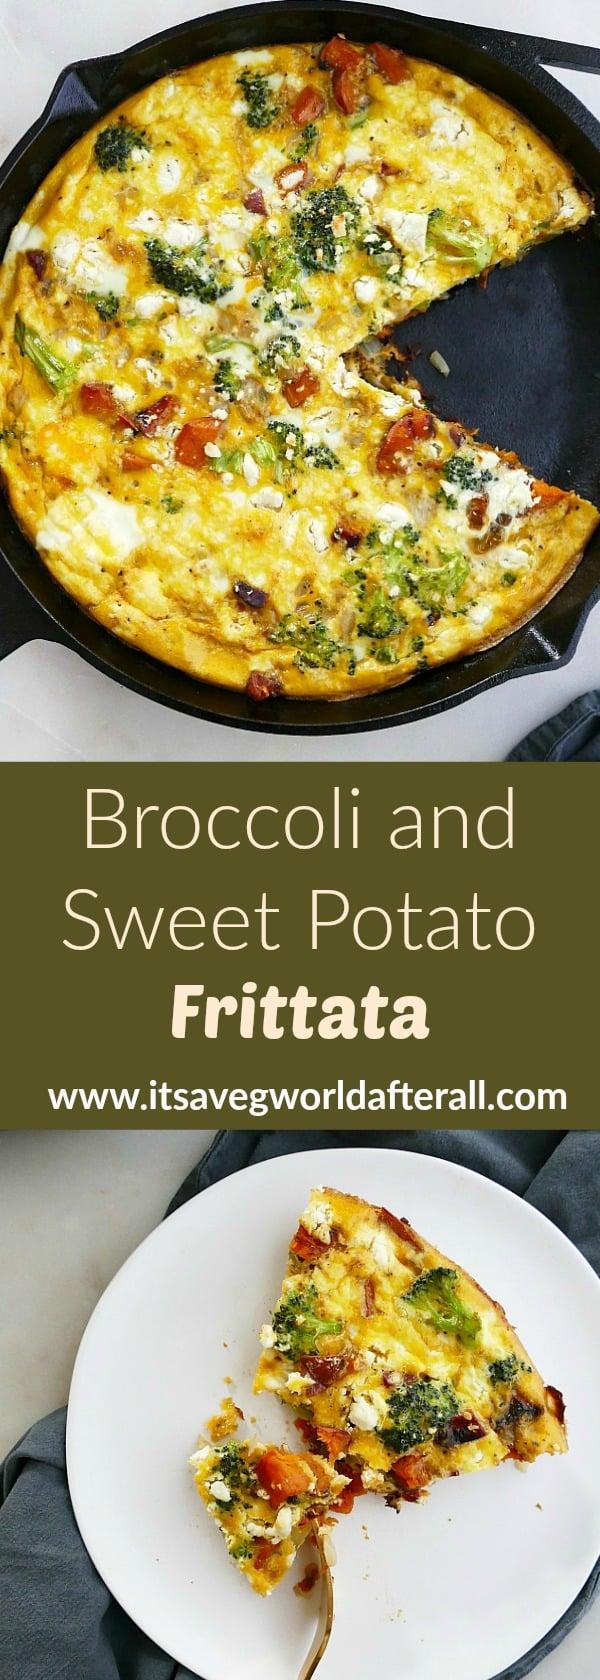 broccoli and sweet potato frittata